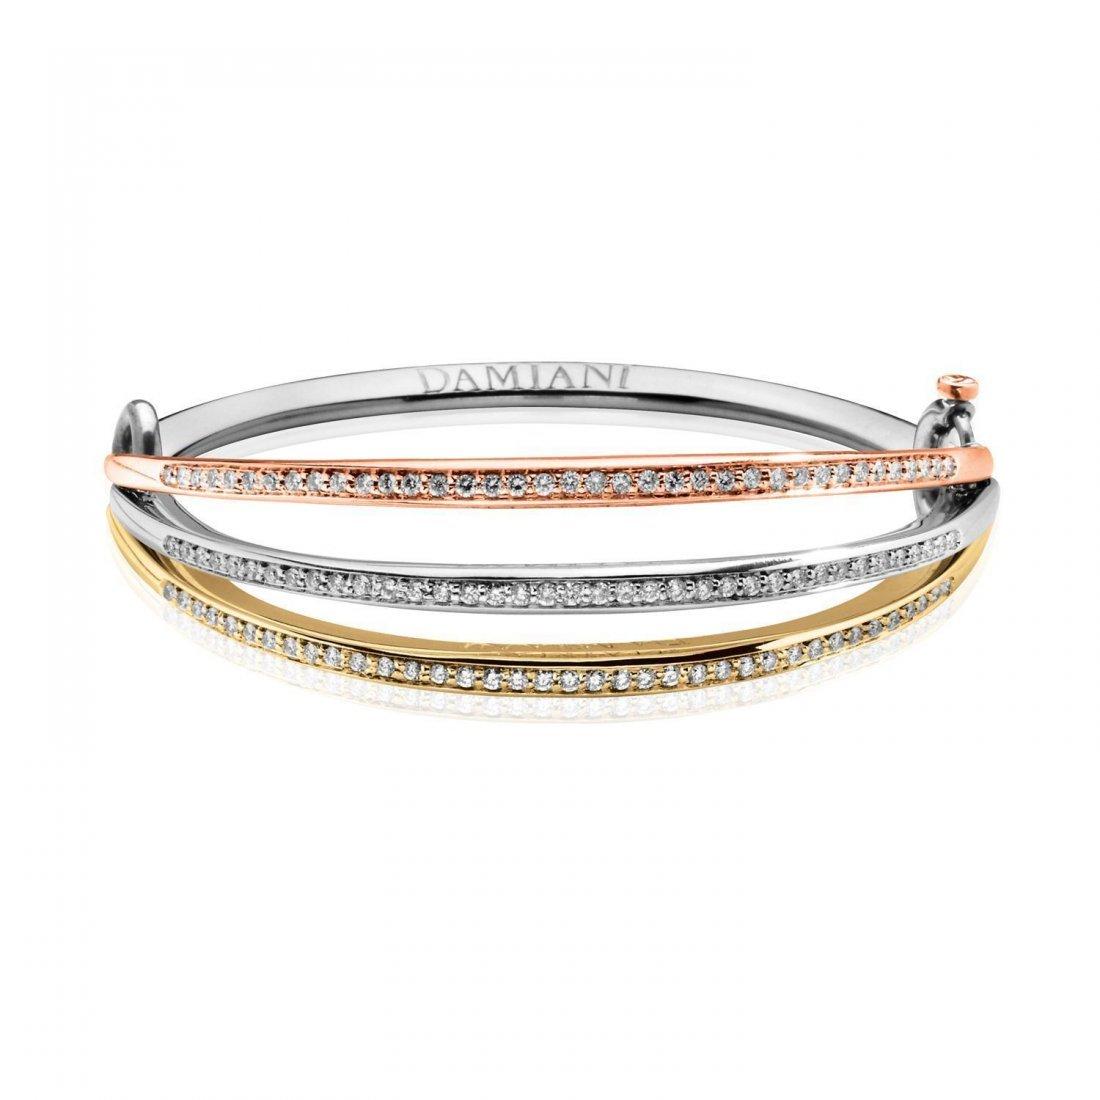 A white gold bracelet by Damiani,